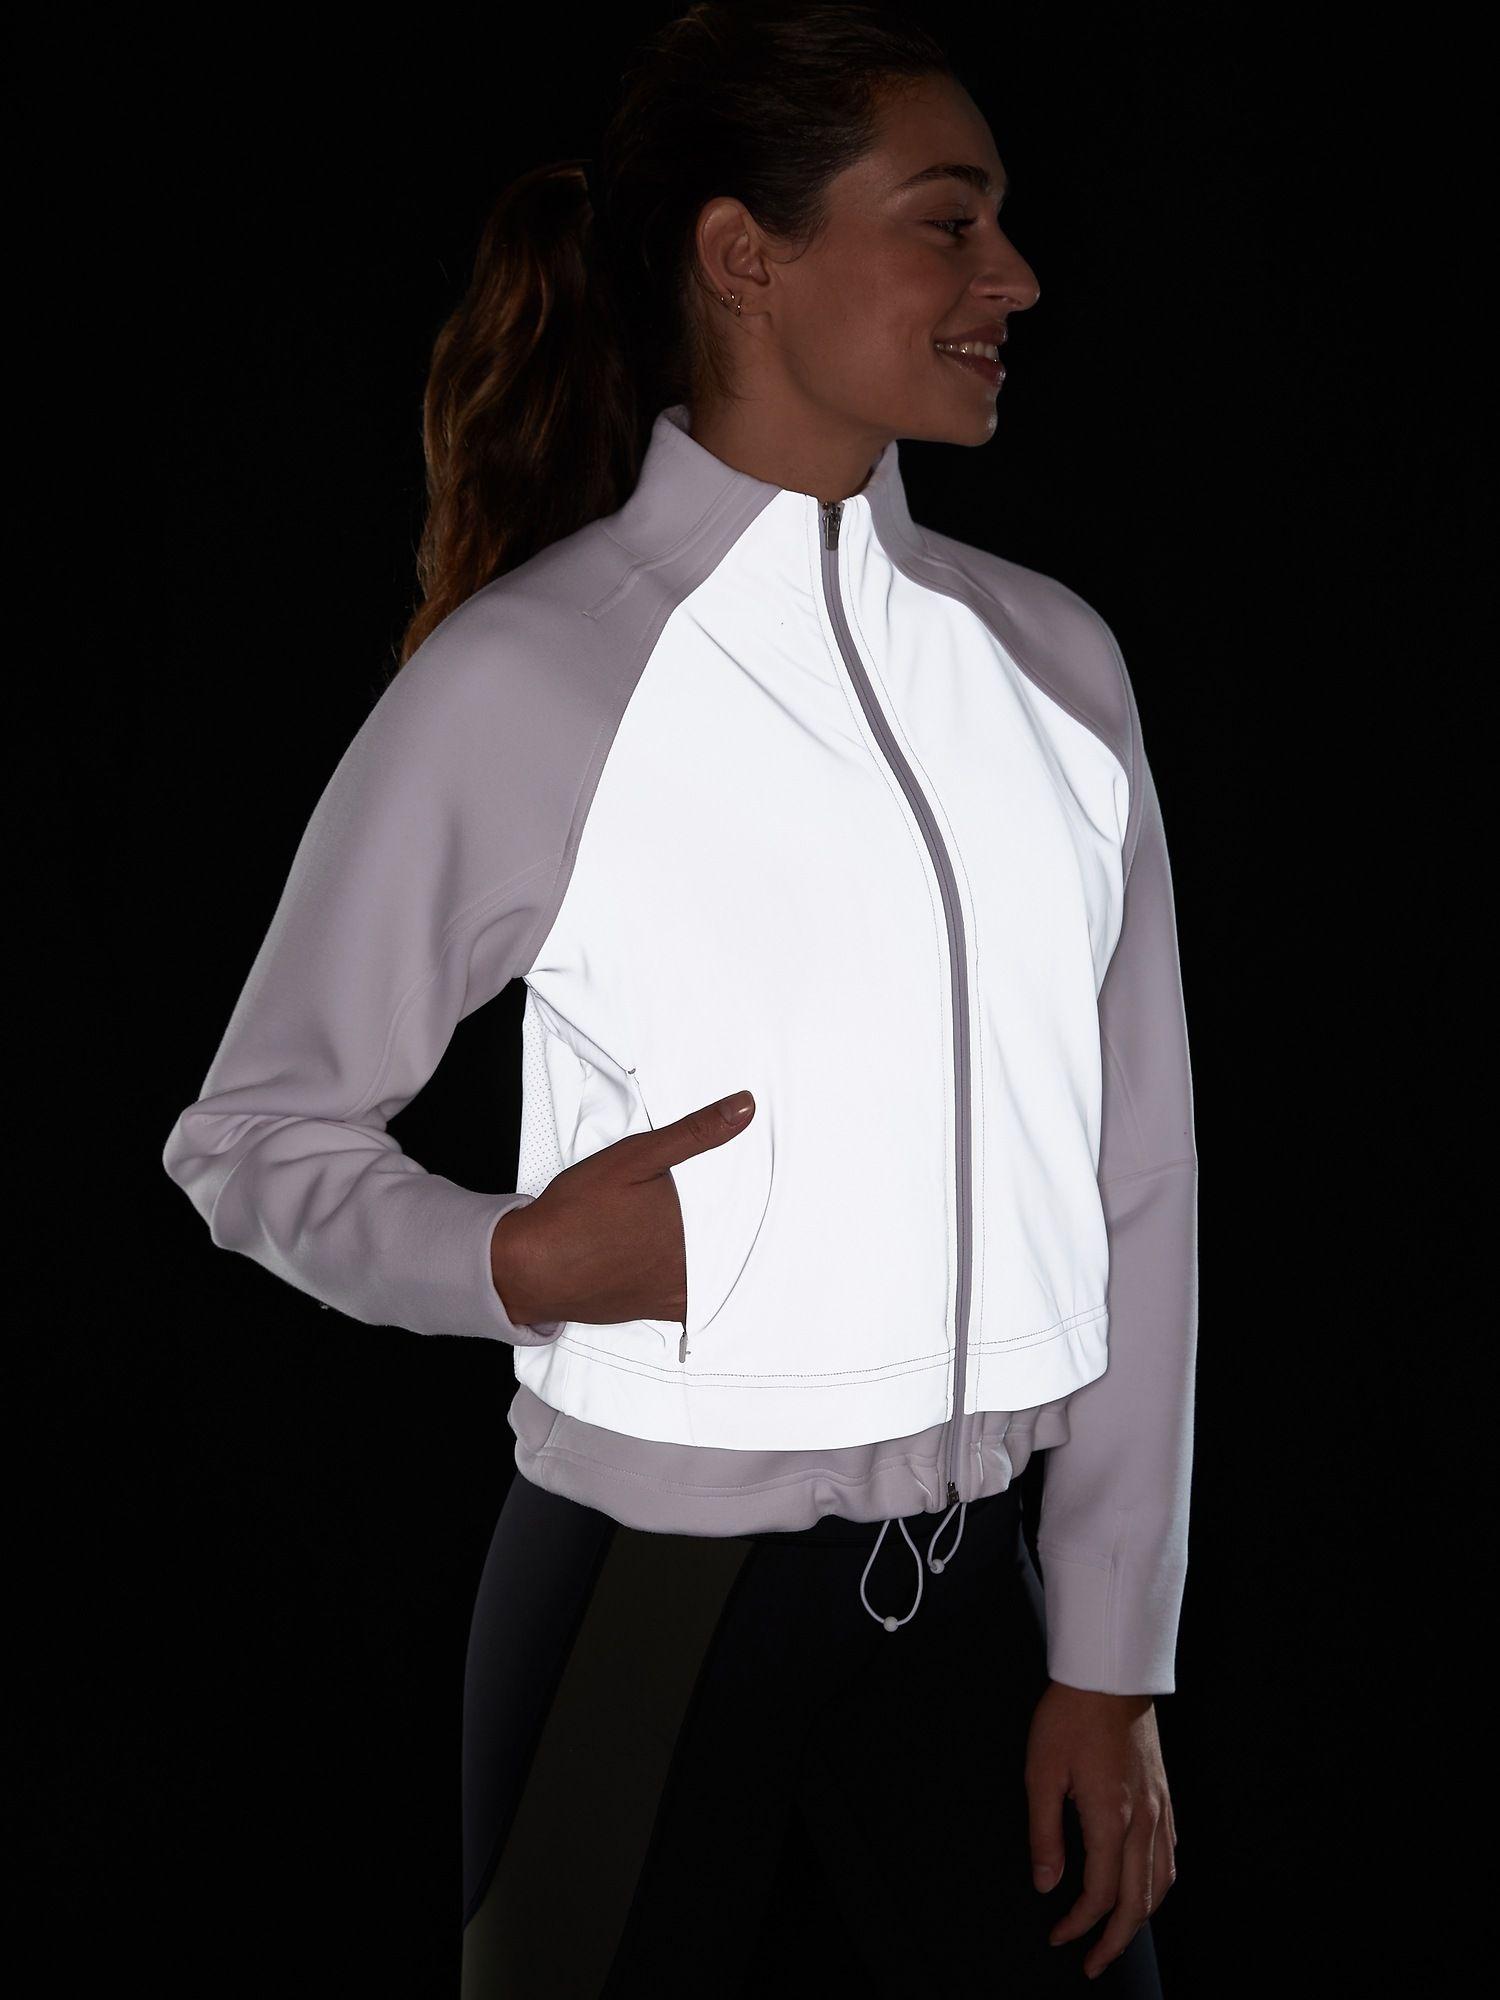 Break Out Reflective Jacket Athleta Reflective Jacket Jackets Fashion [ 2000 x 1500 Pixel ]